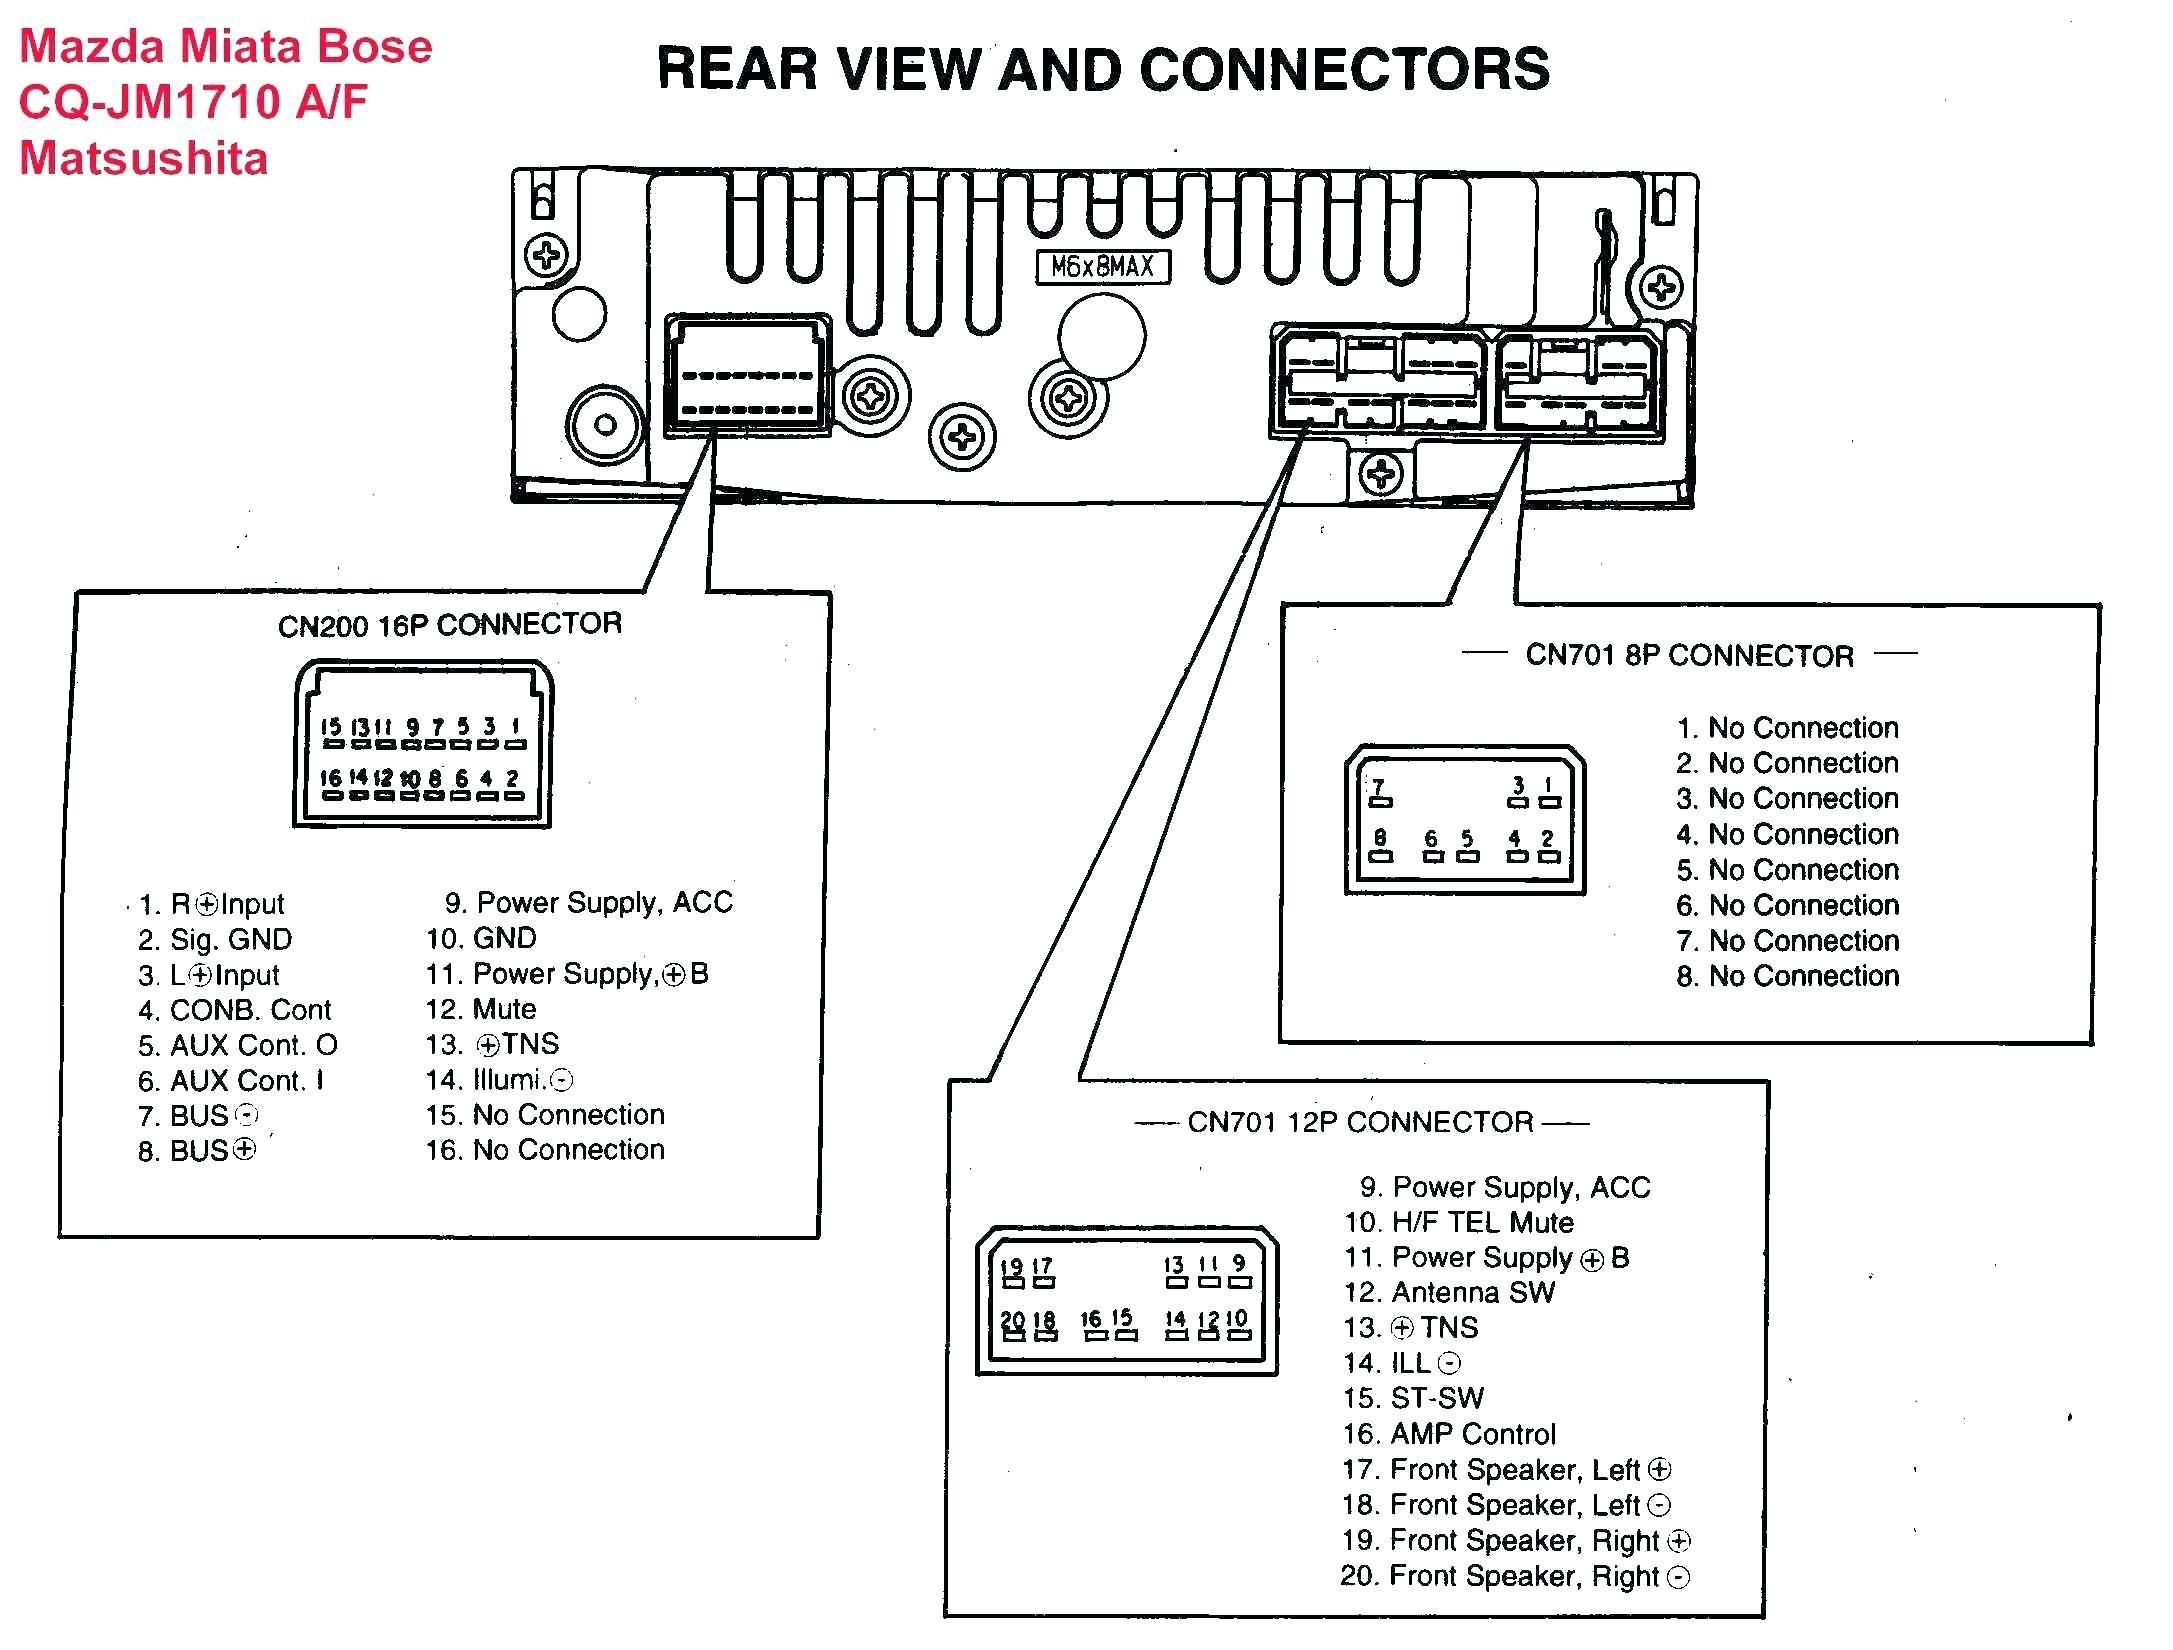 2000 chevy cavalier wiring diagram tm 5481  2004 chevy cavalier fuel pump wiring diagram on 2000 2000 chevy cavalier wiring harness diagram 2004 chevy cavalier fuel pump wiring